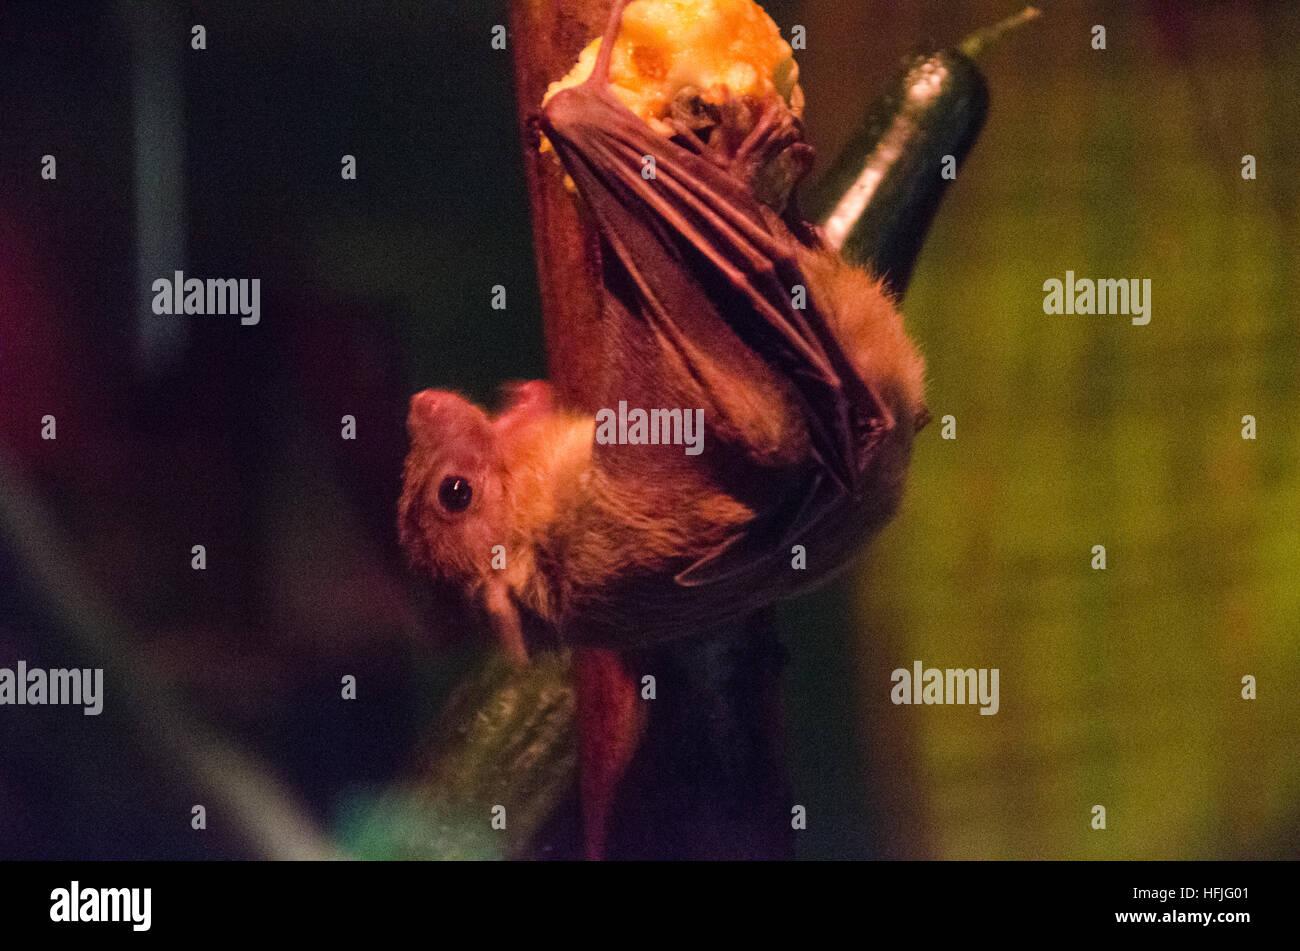 Bat feeding on an apple - Stock Image